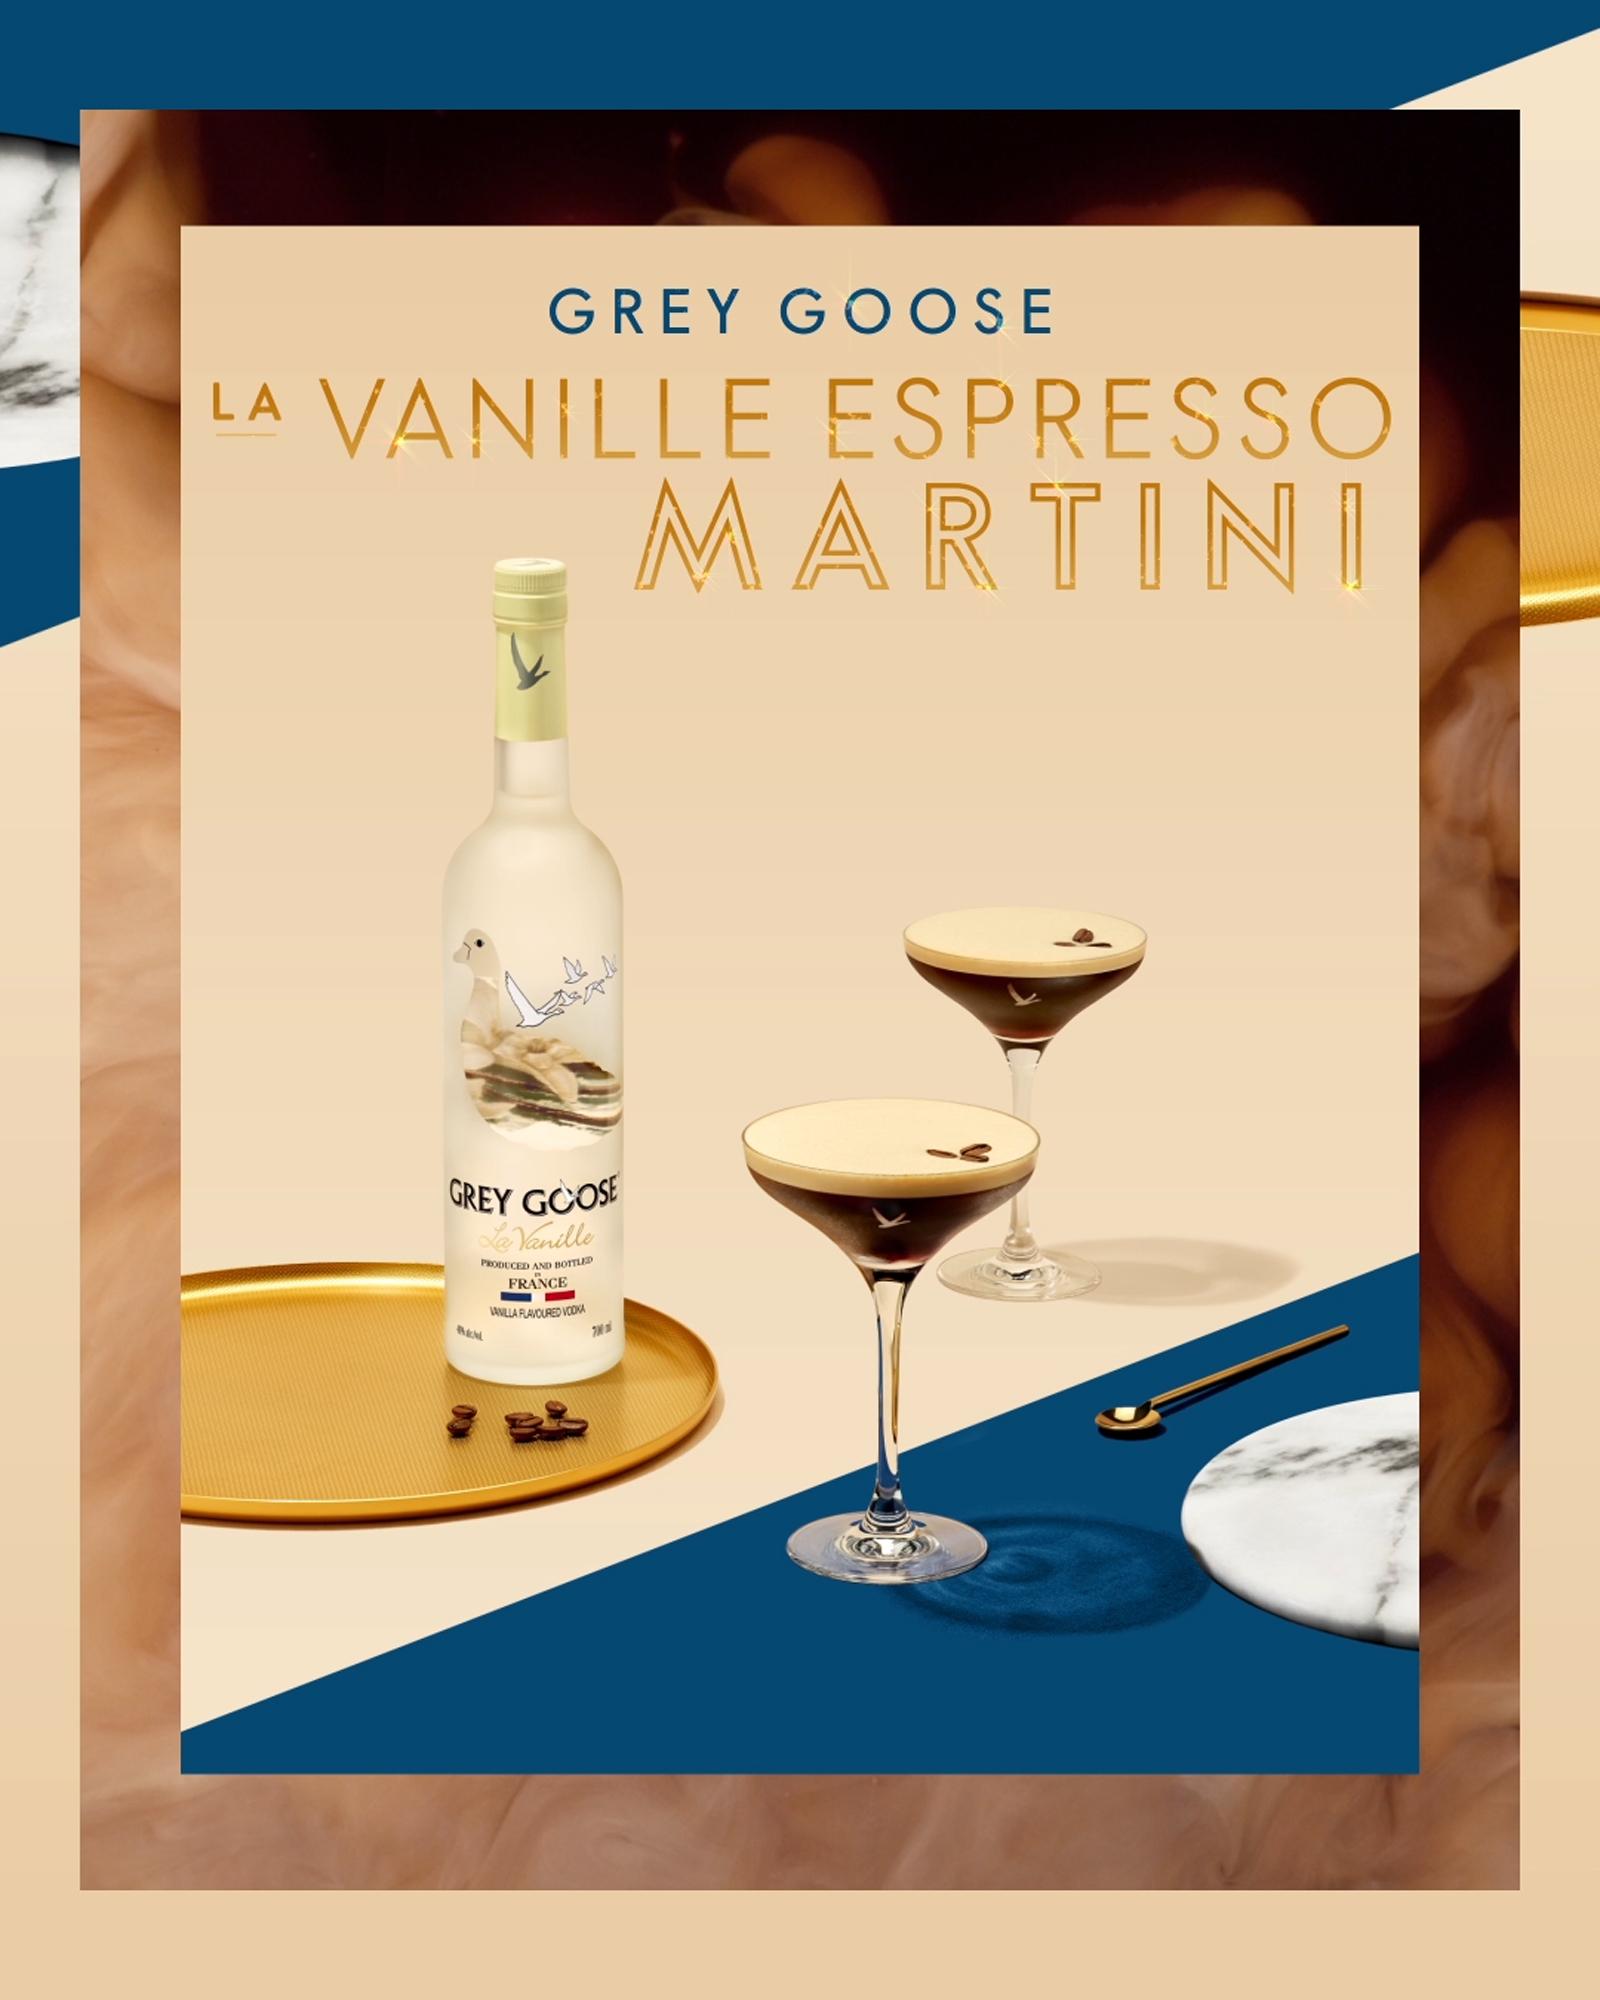 GreyGoose-LaVanilleEspressoMartini_portrait copy.jpg